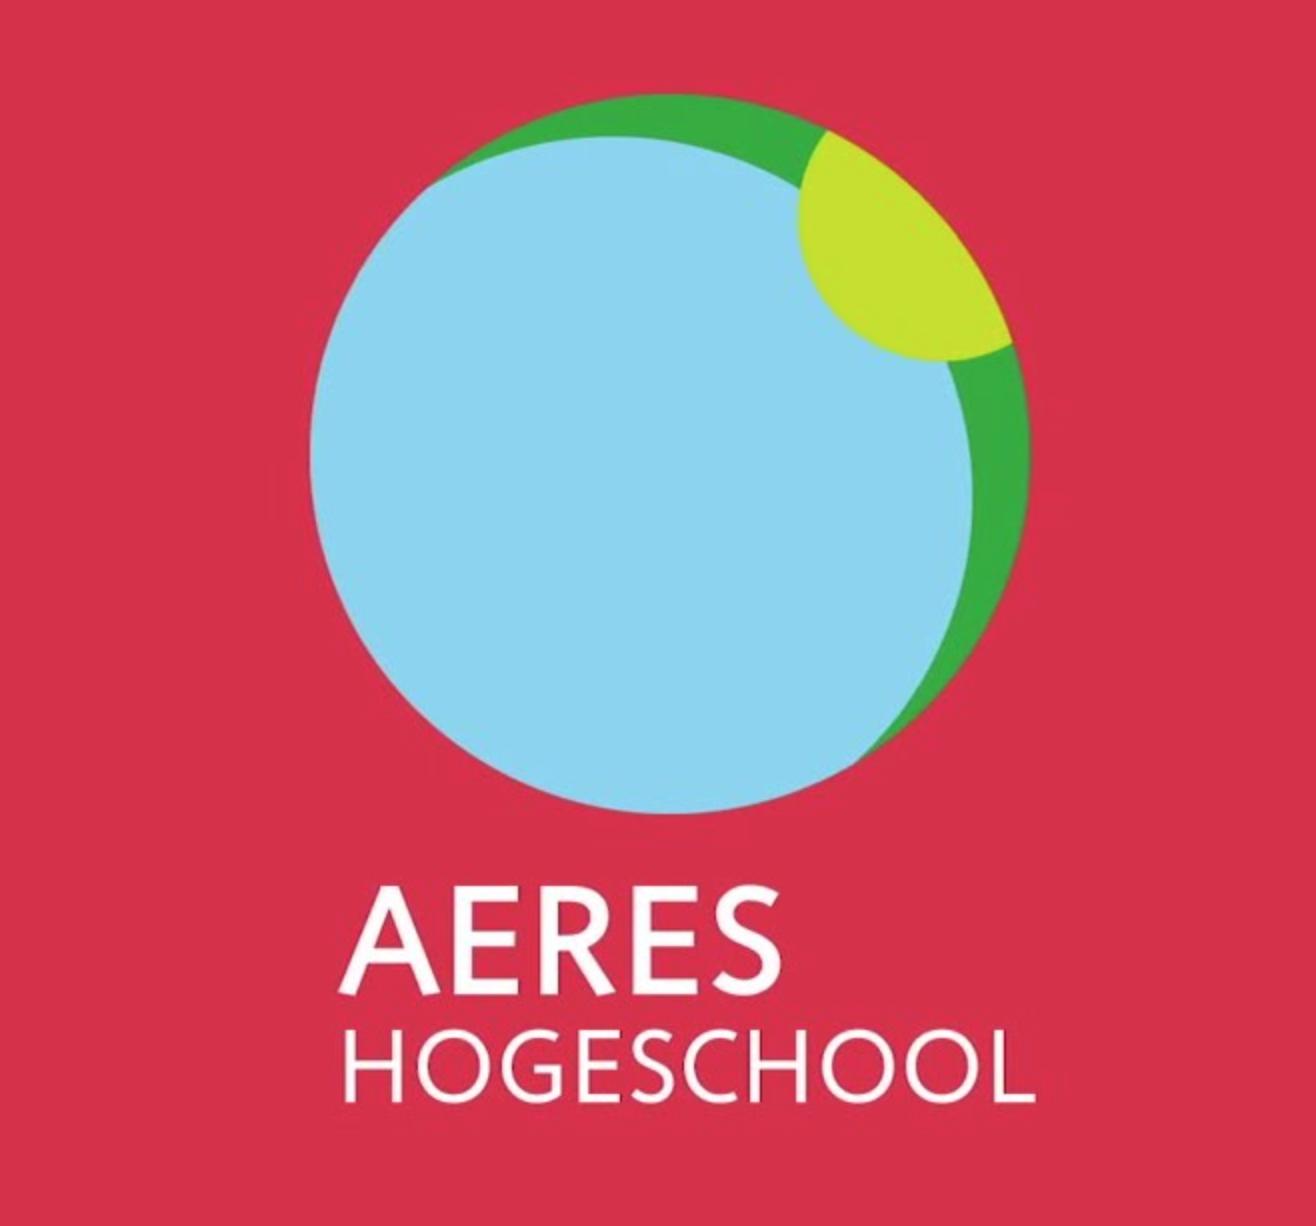 Aeres University of Applied Sciences